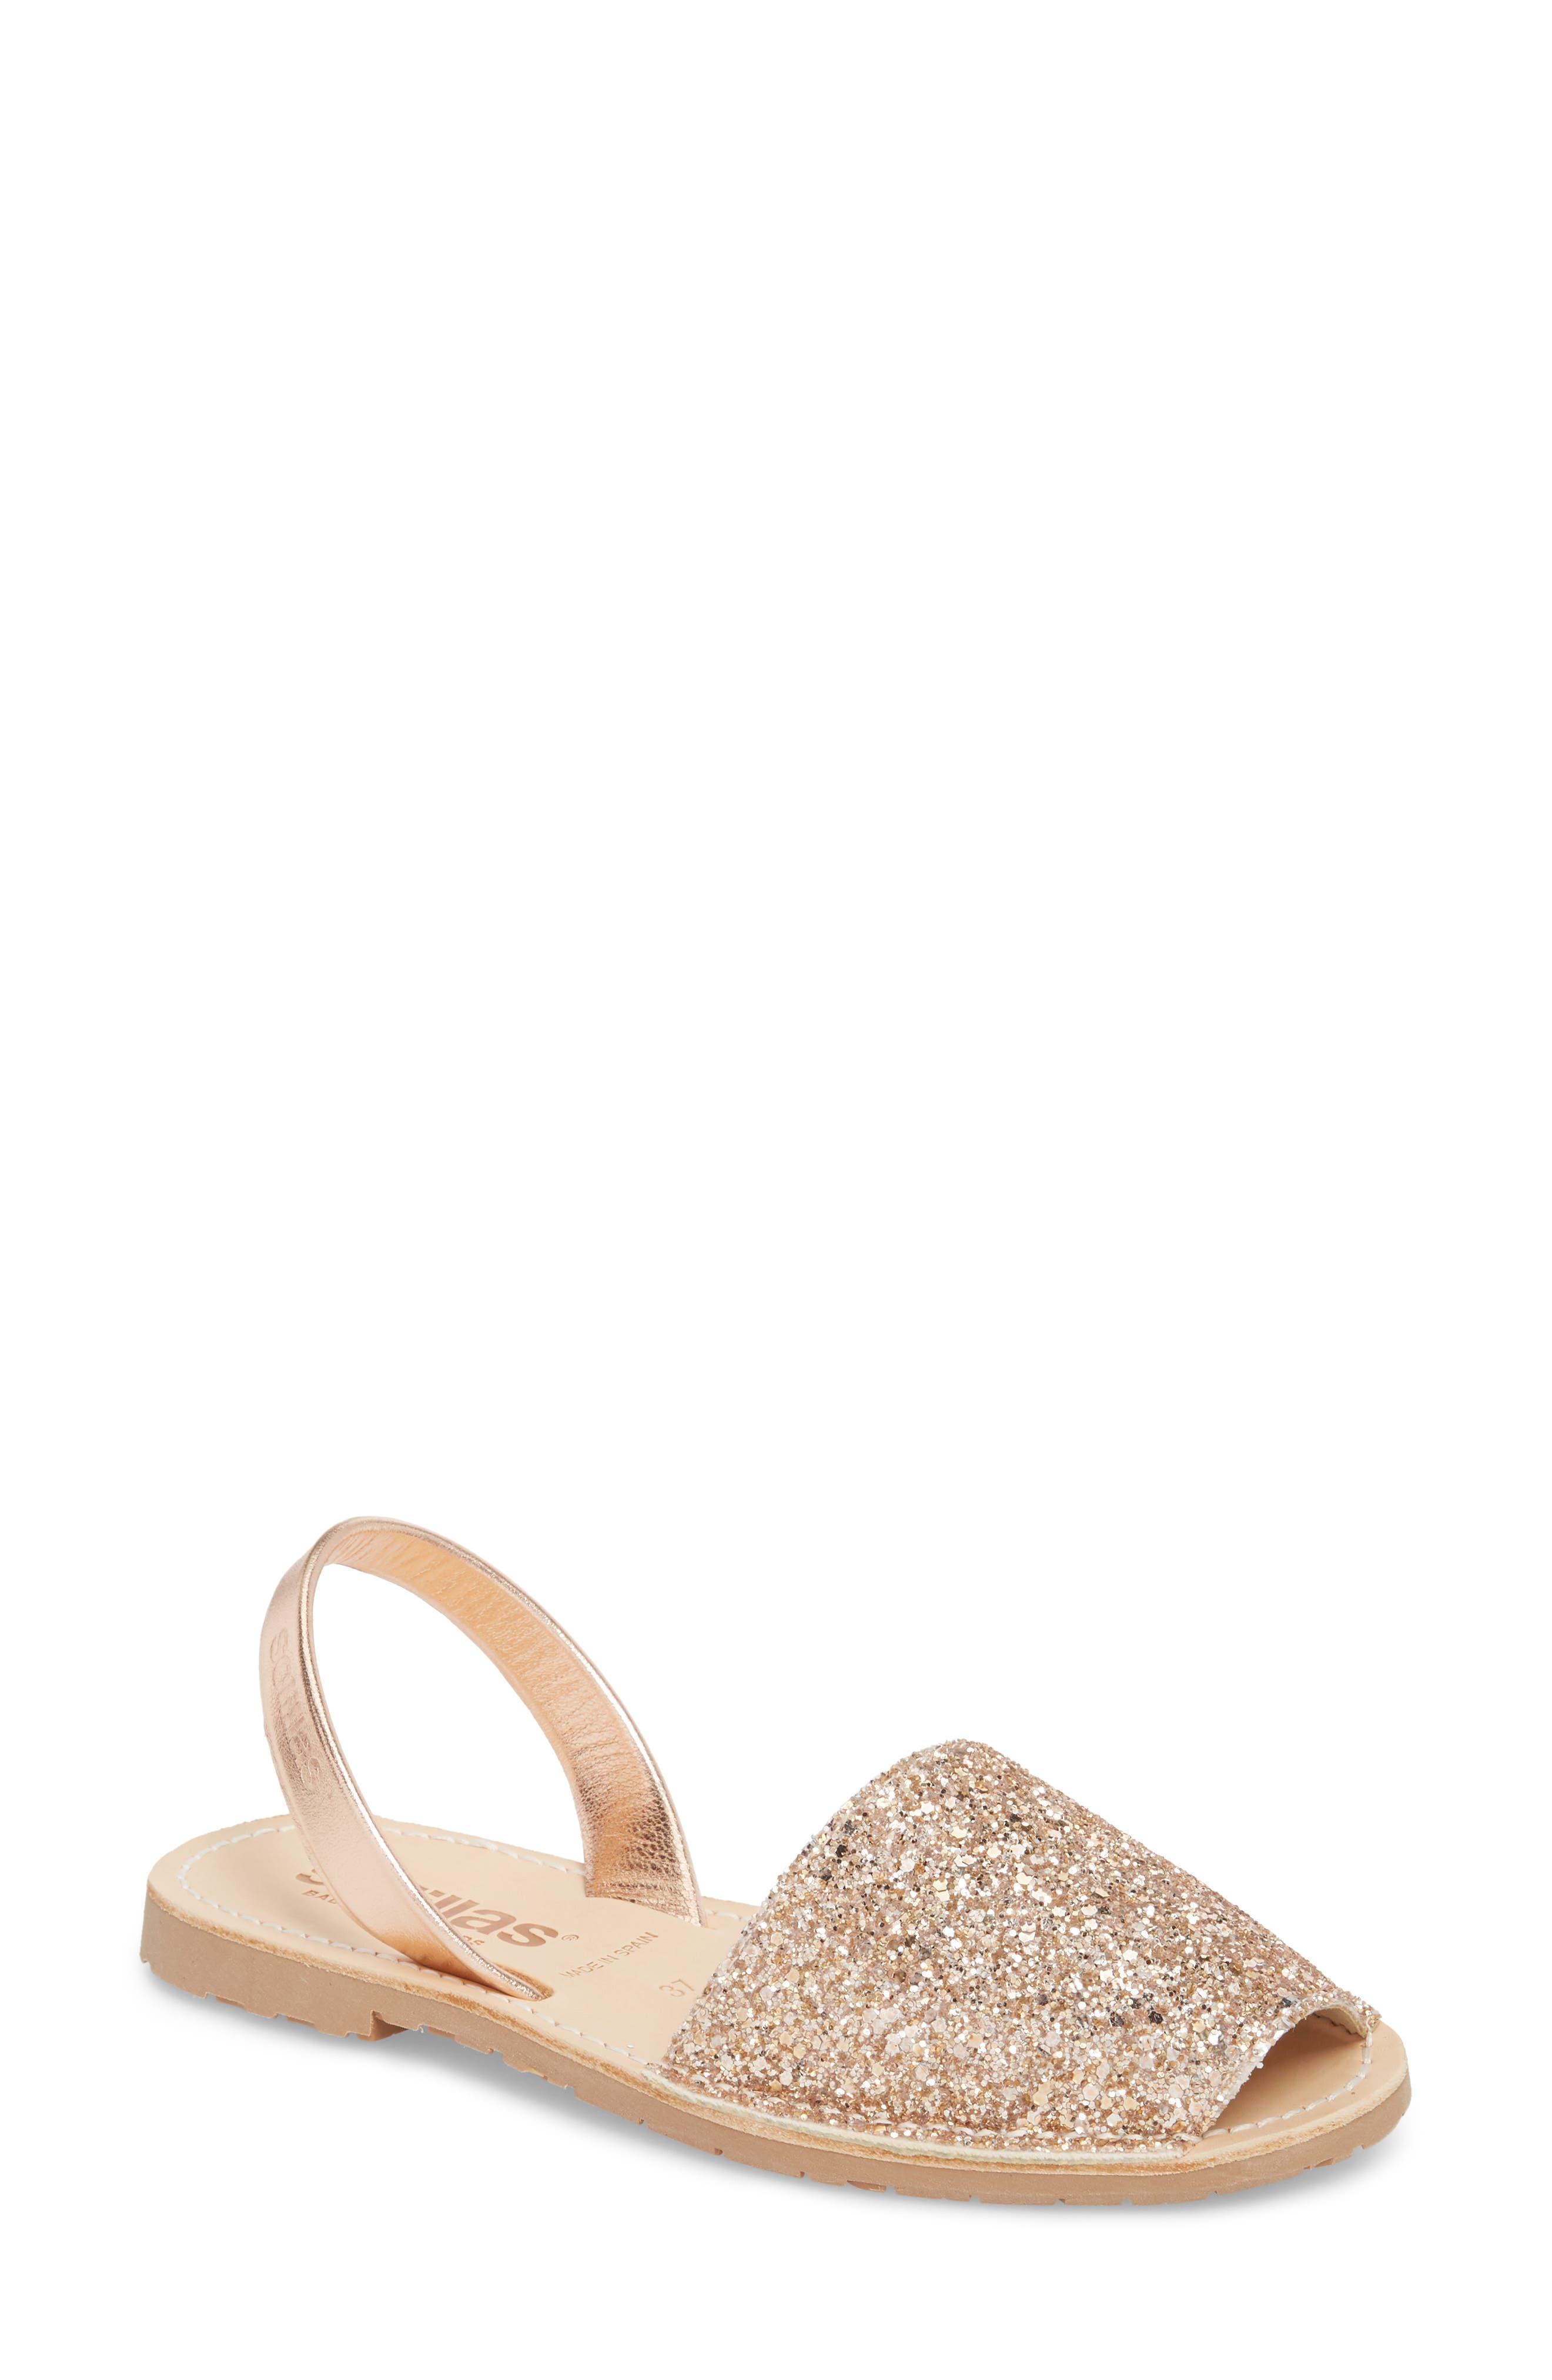 Flat Sandal,                             Main thumbnail 1, color,                             Rose Gold Leather